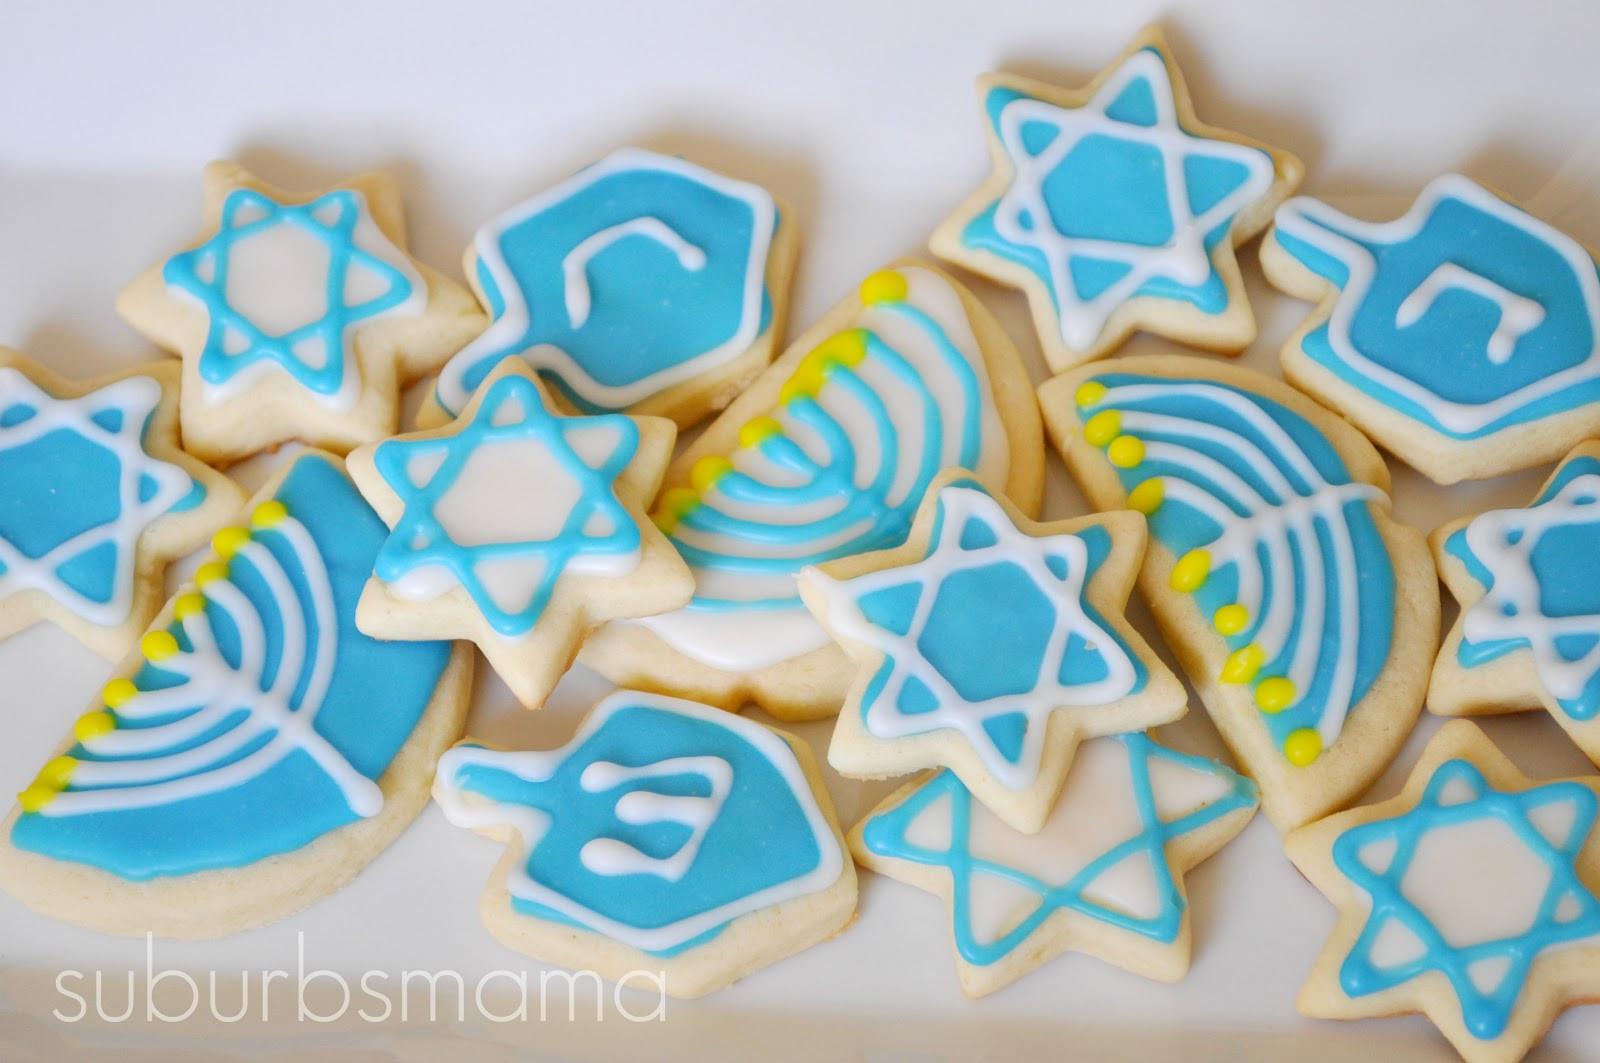 Hanukkah Sugar Cookies  Suburbs Mama Iced Sugar Cookies